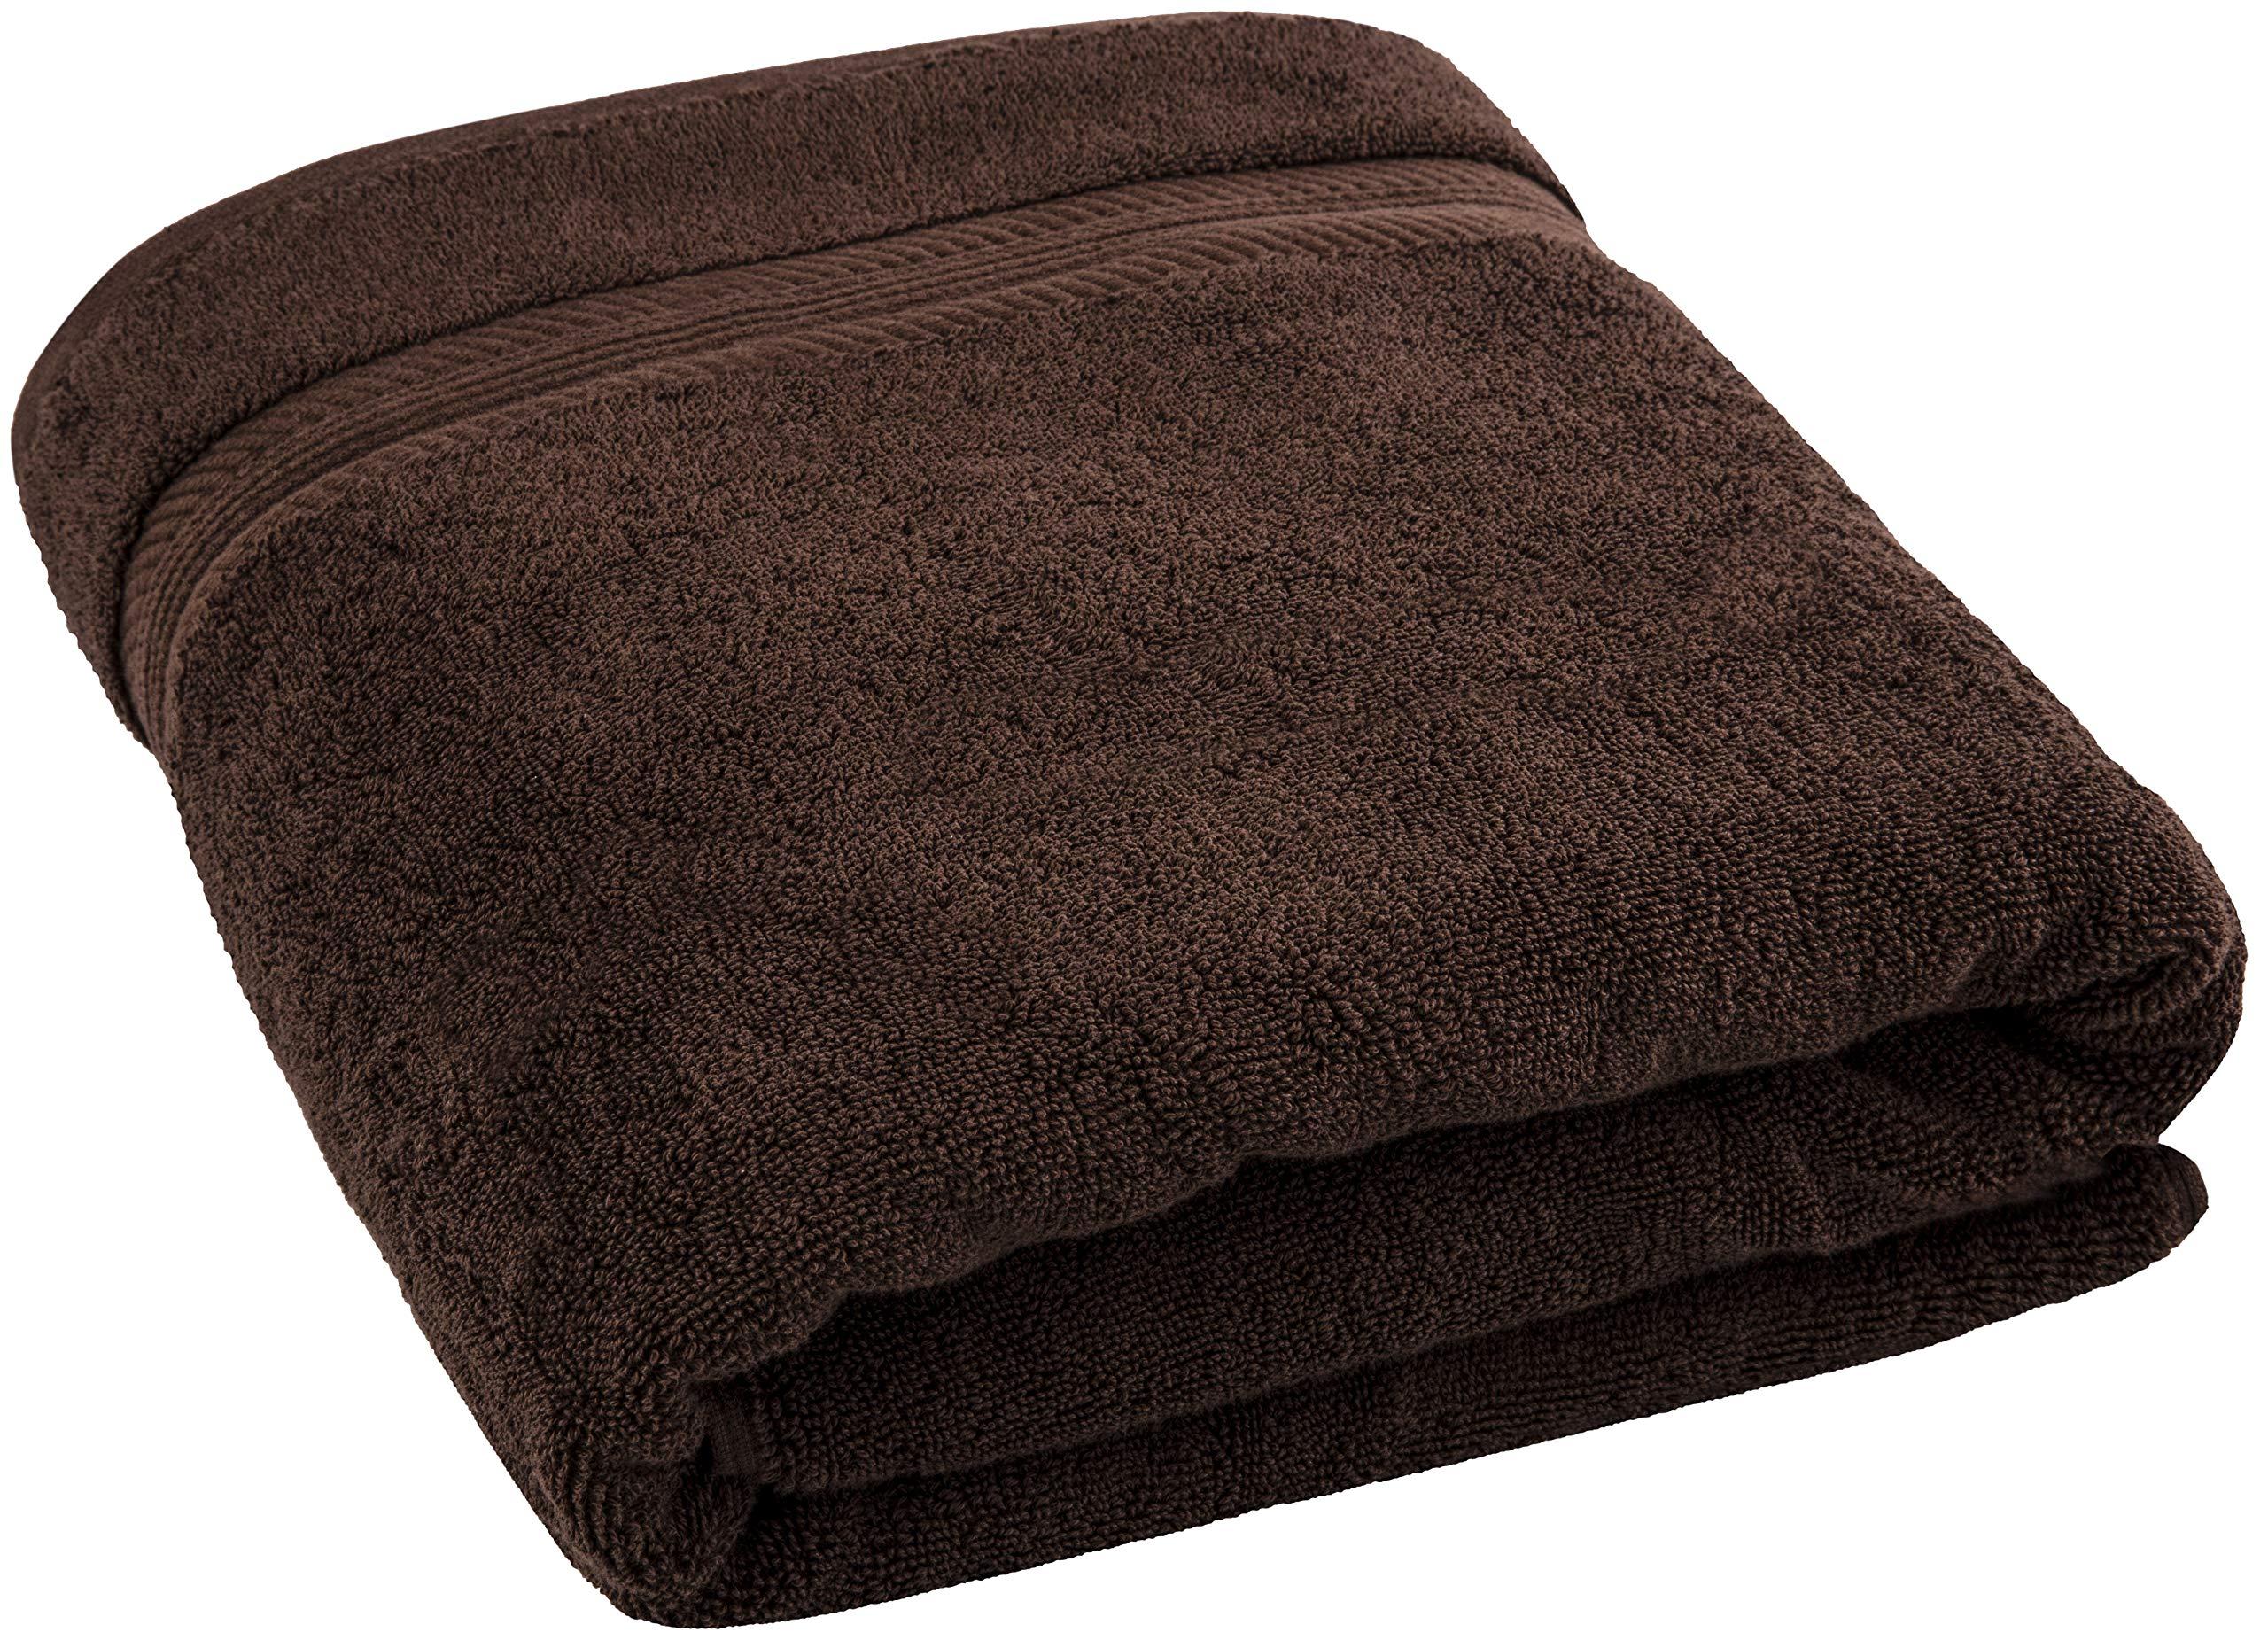 American Bath Towels, 35x70 Oversized 650 GSM Premium Hotel & Spa Quality Organic Turkish Cotton Bath Sheet for Softness & Absorbency, Dark Brown by AmericanBathTowels